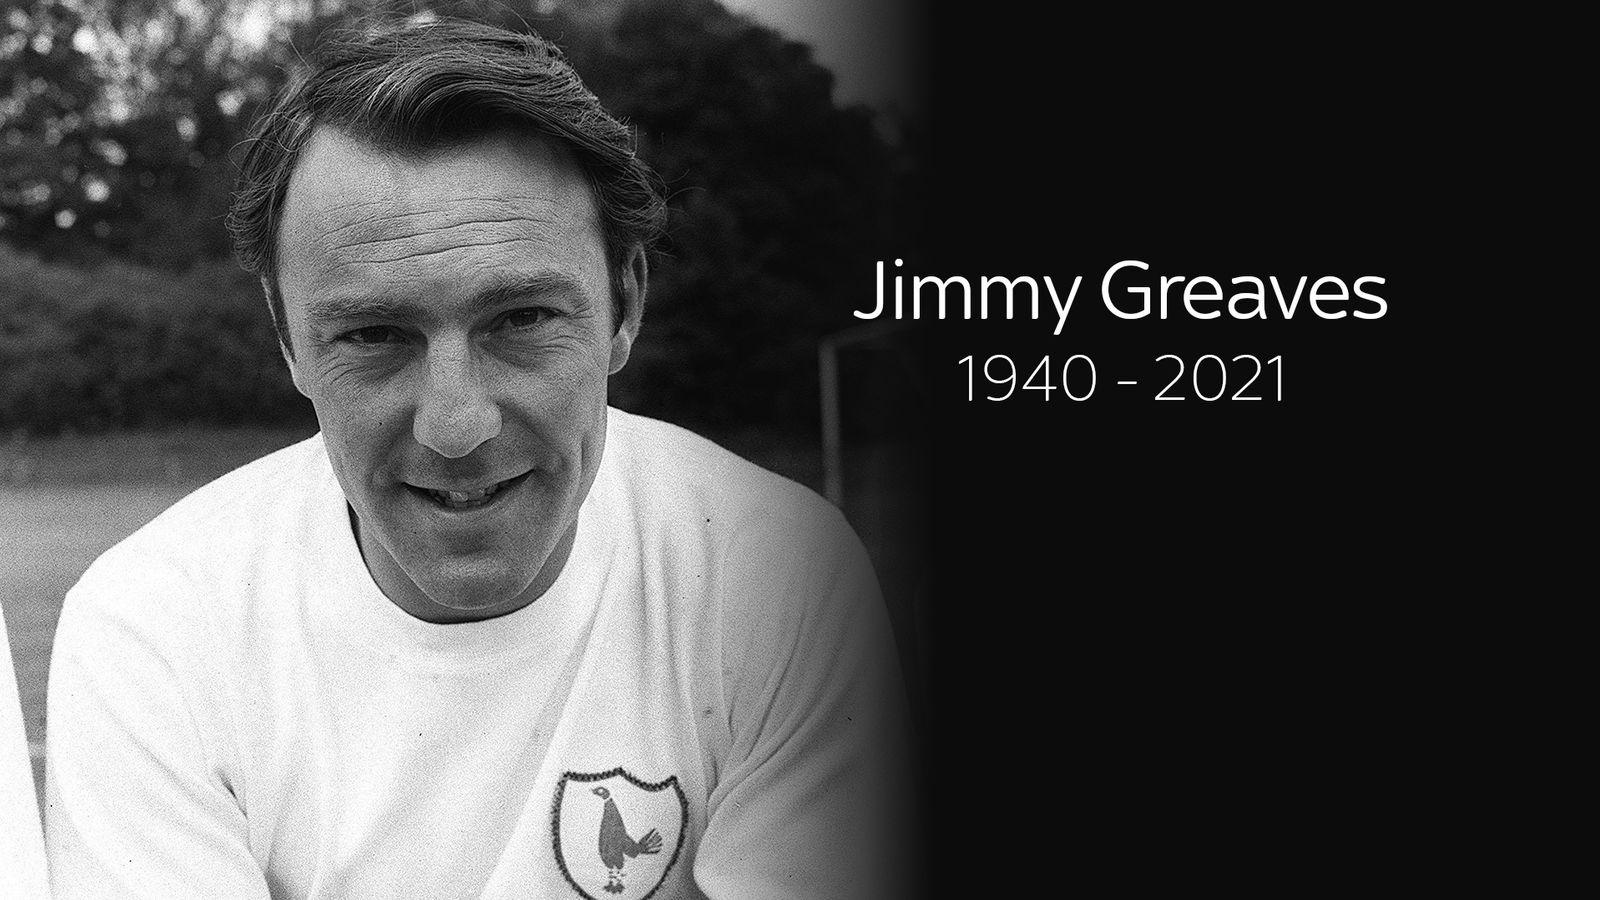 Jimmy Greaves: Former England, Tottenham and Chelsea striker dies aged 81